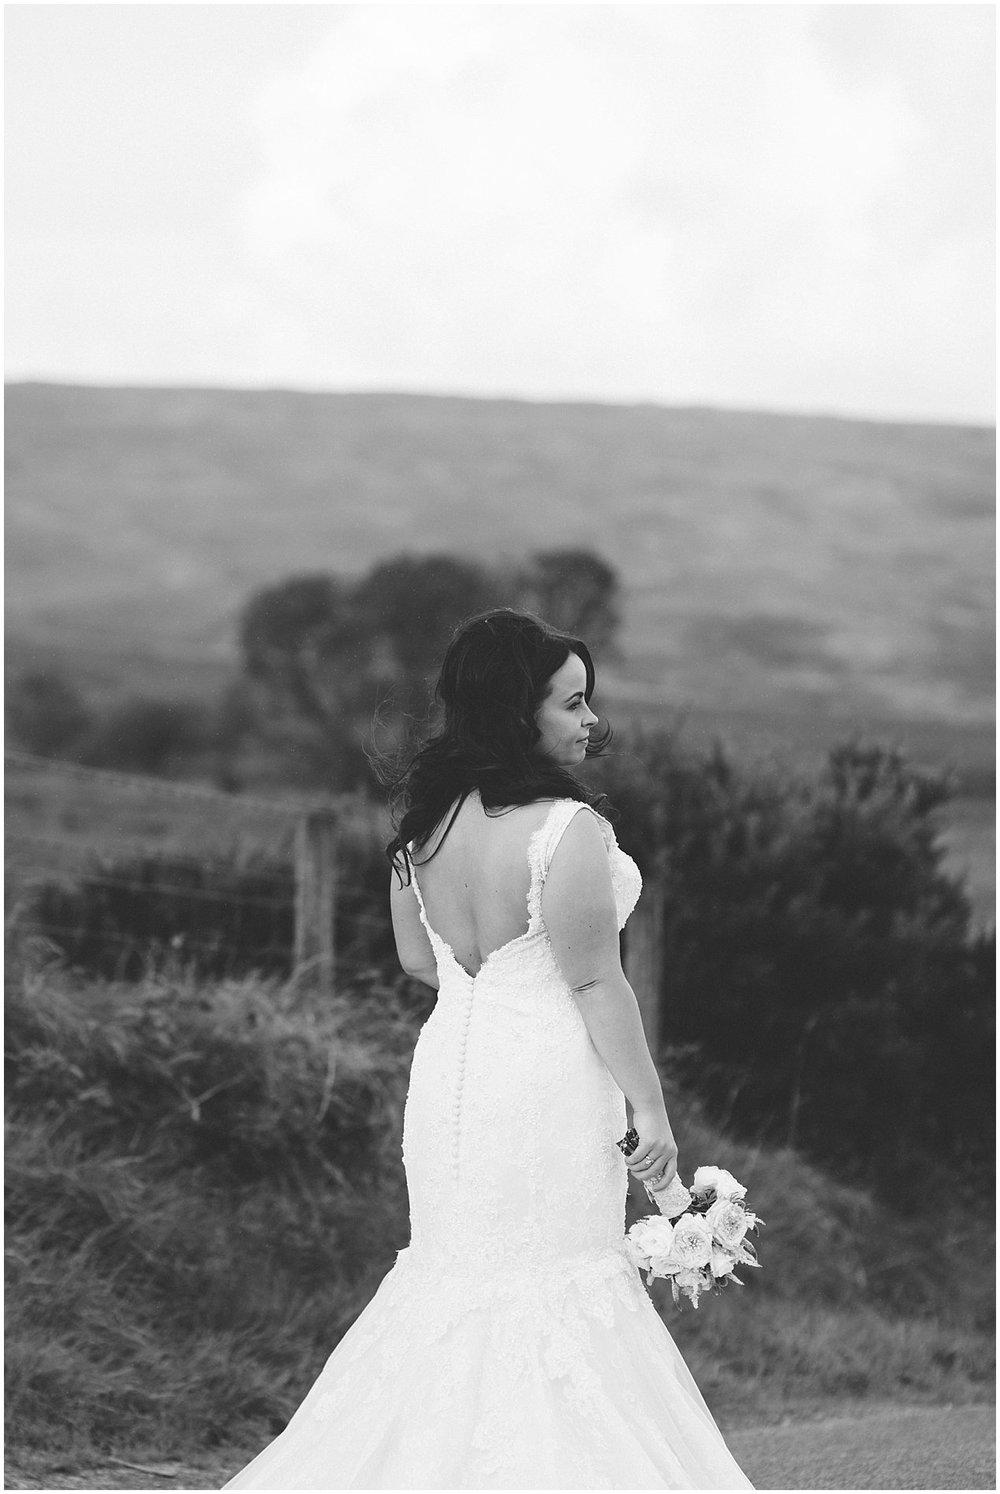 Shauneen_PJ_Hillgrove_Hotel_Monaghan_Wedding_jude_browne_photography_0063.jpg